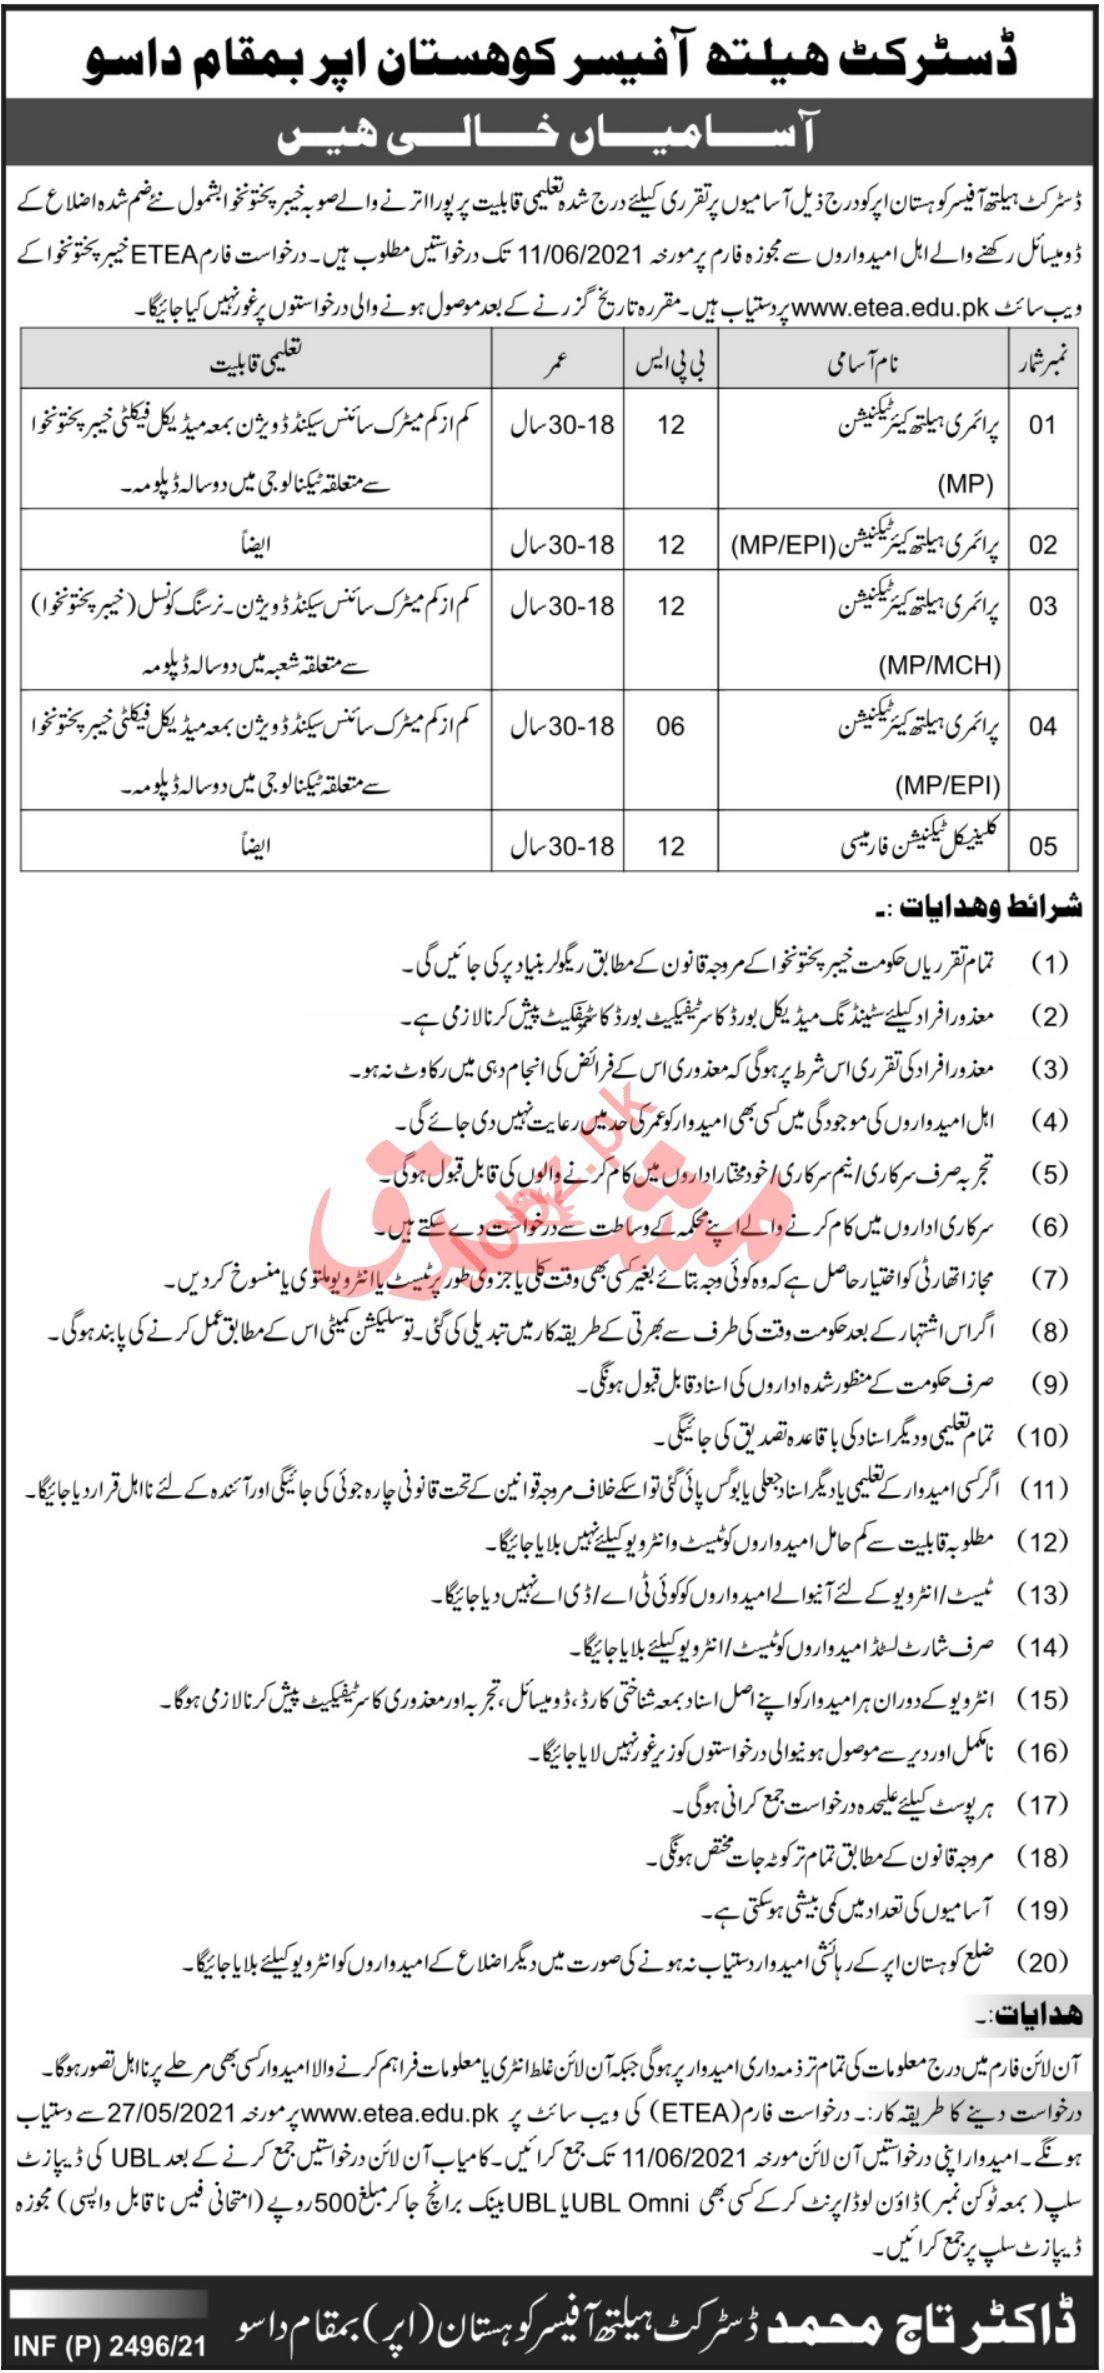 DHO Kohistan Upper DHO Dir Upper Jobs ETEA Result 4 September 2021 District Health Office